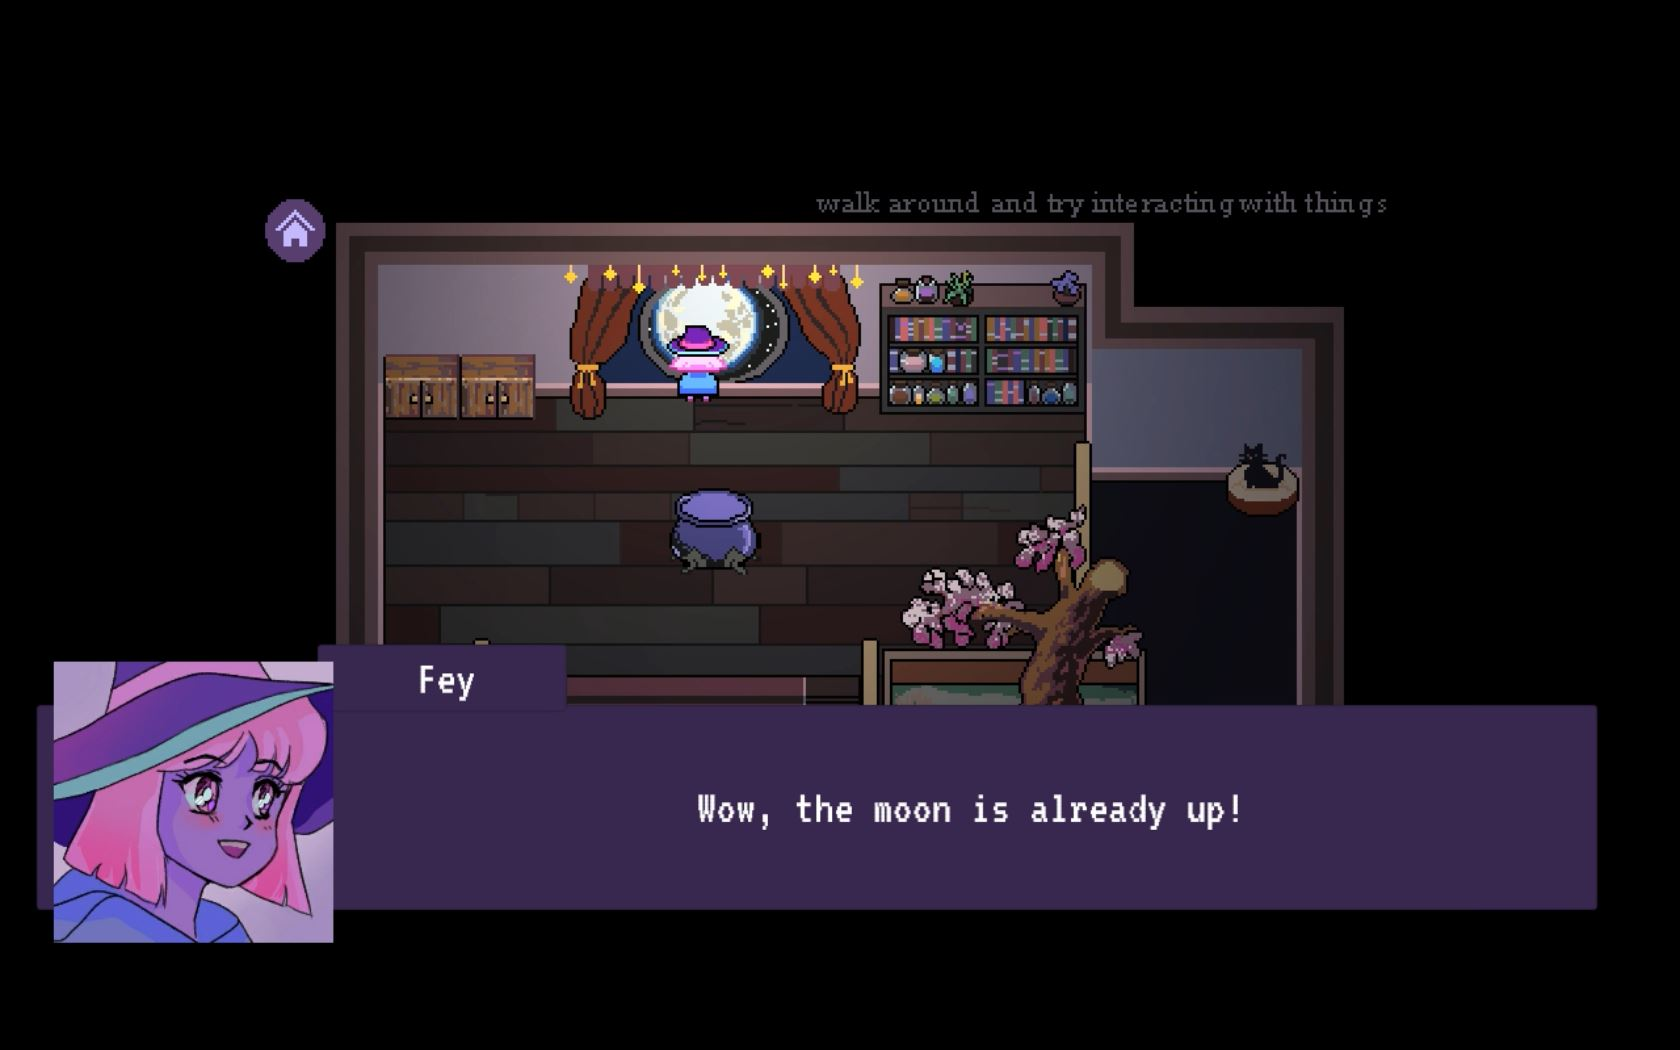 Fey the Potion Maker